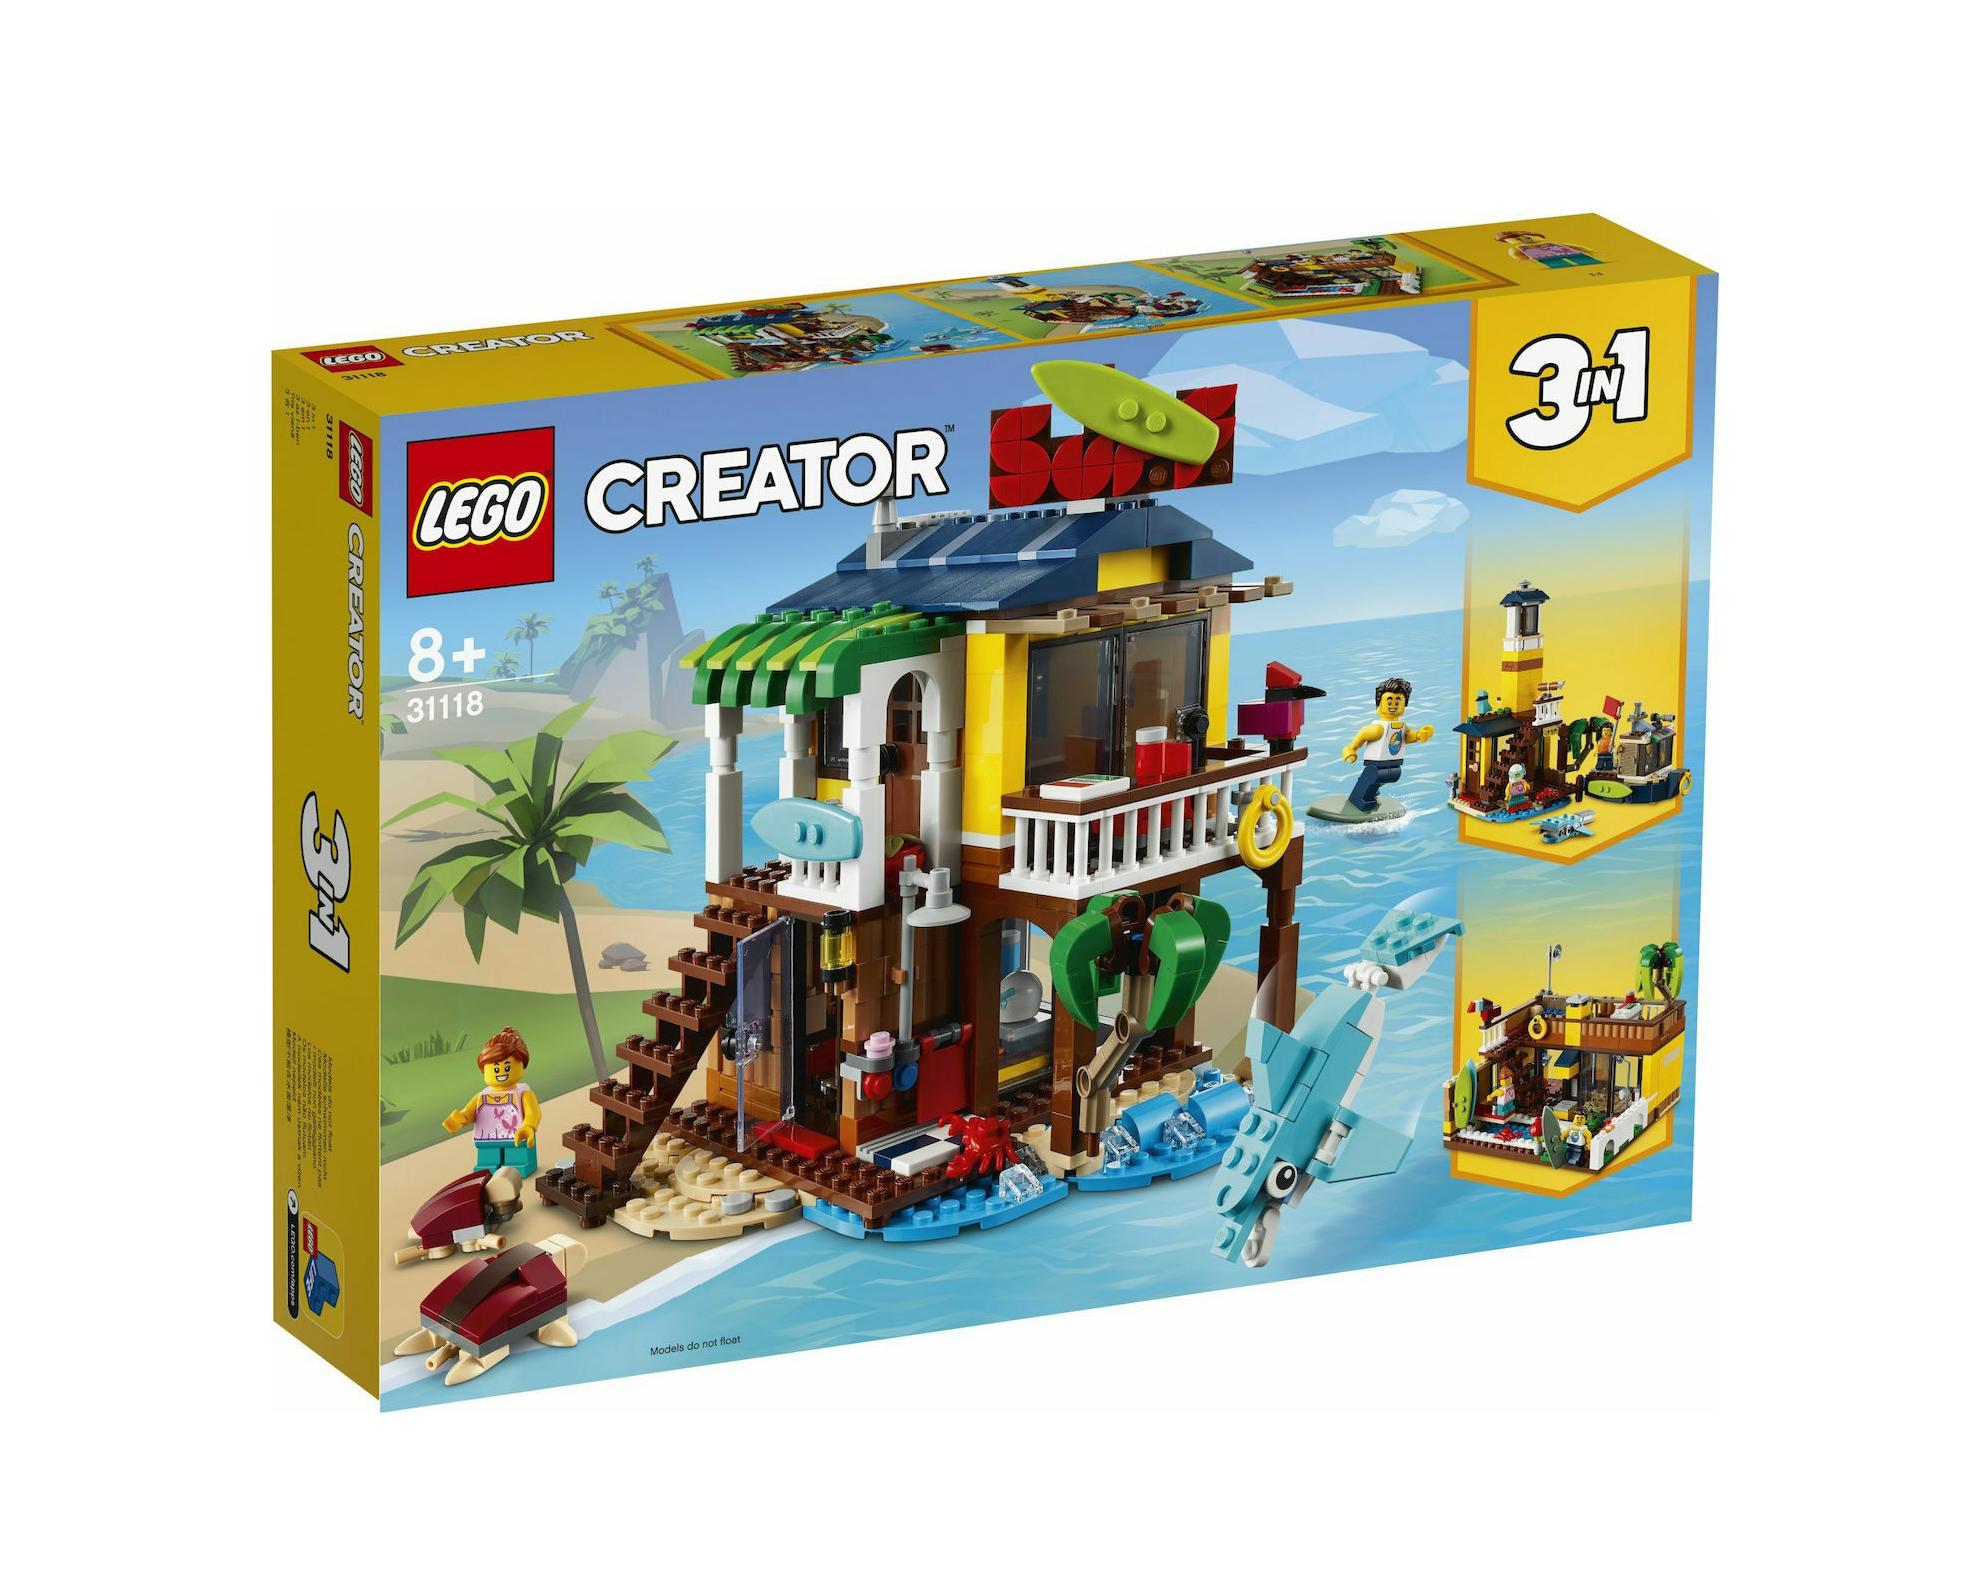 Lego Creator: 3 in 1 Surfer Beach House 31118